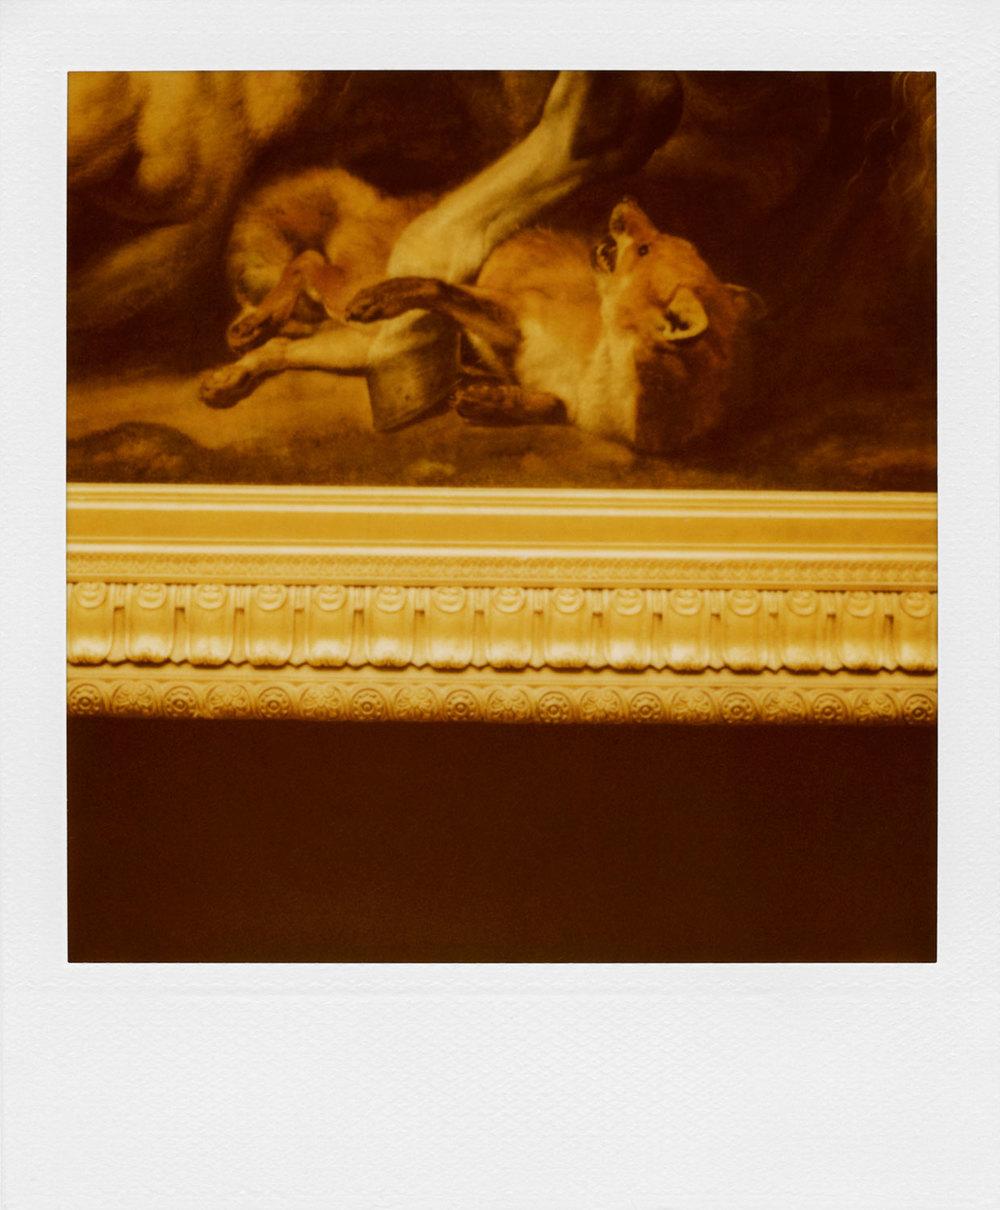 polaroid-22.jpg